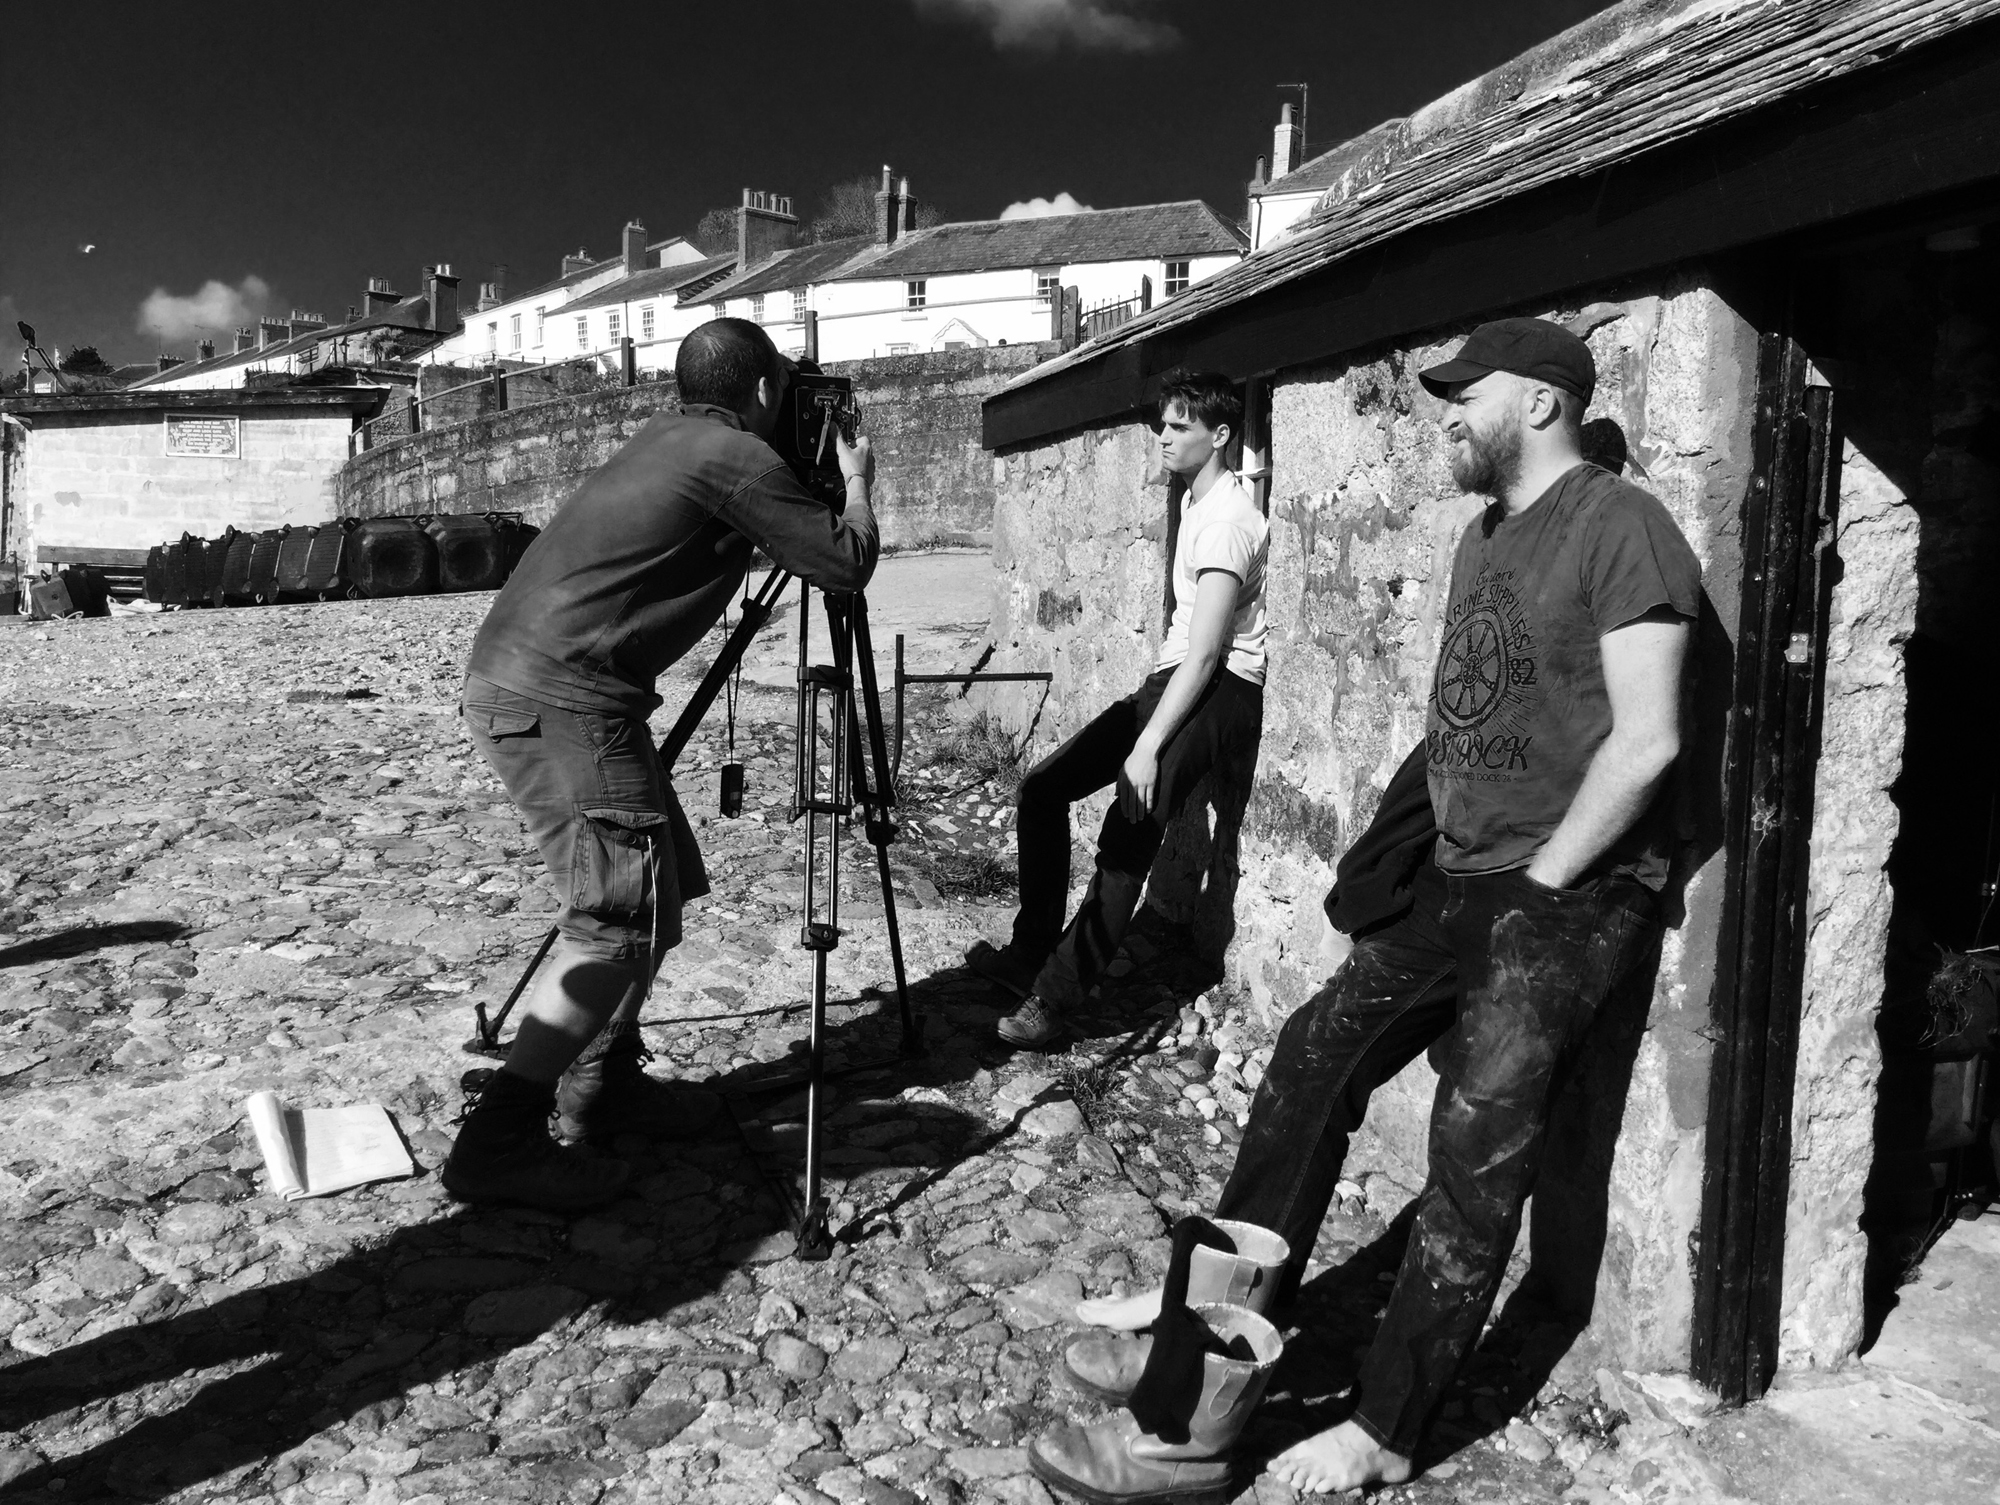 On set in Charlestown (l-r): Mark Jenkin, Isaac Woodvine, Edward Rowe. Photo: Early Day Films